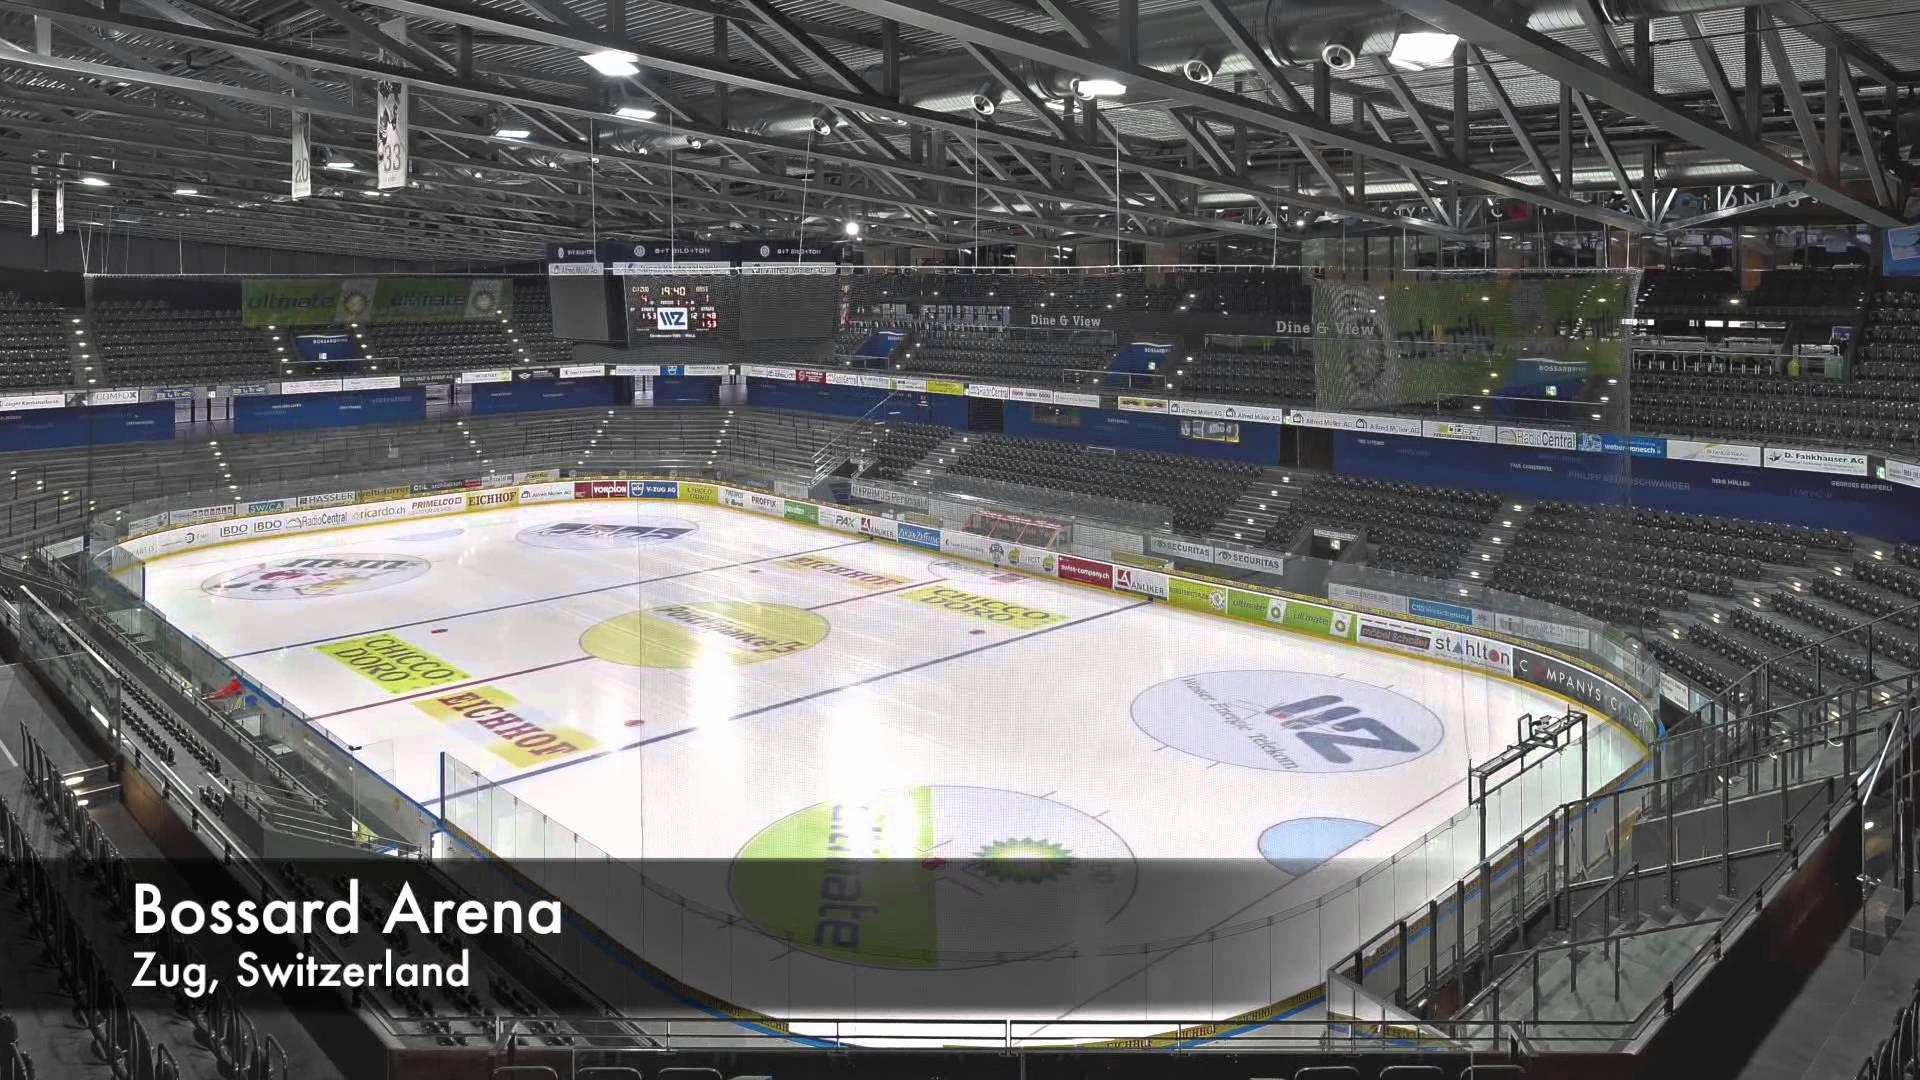 La Bossard Arena